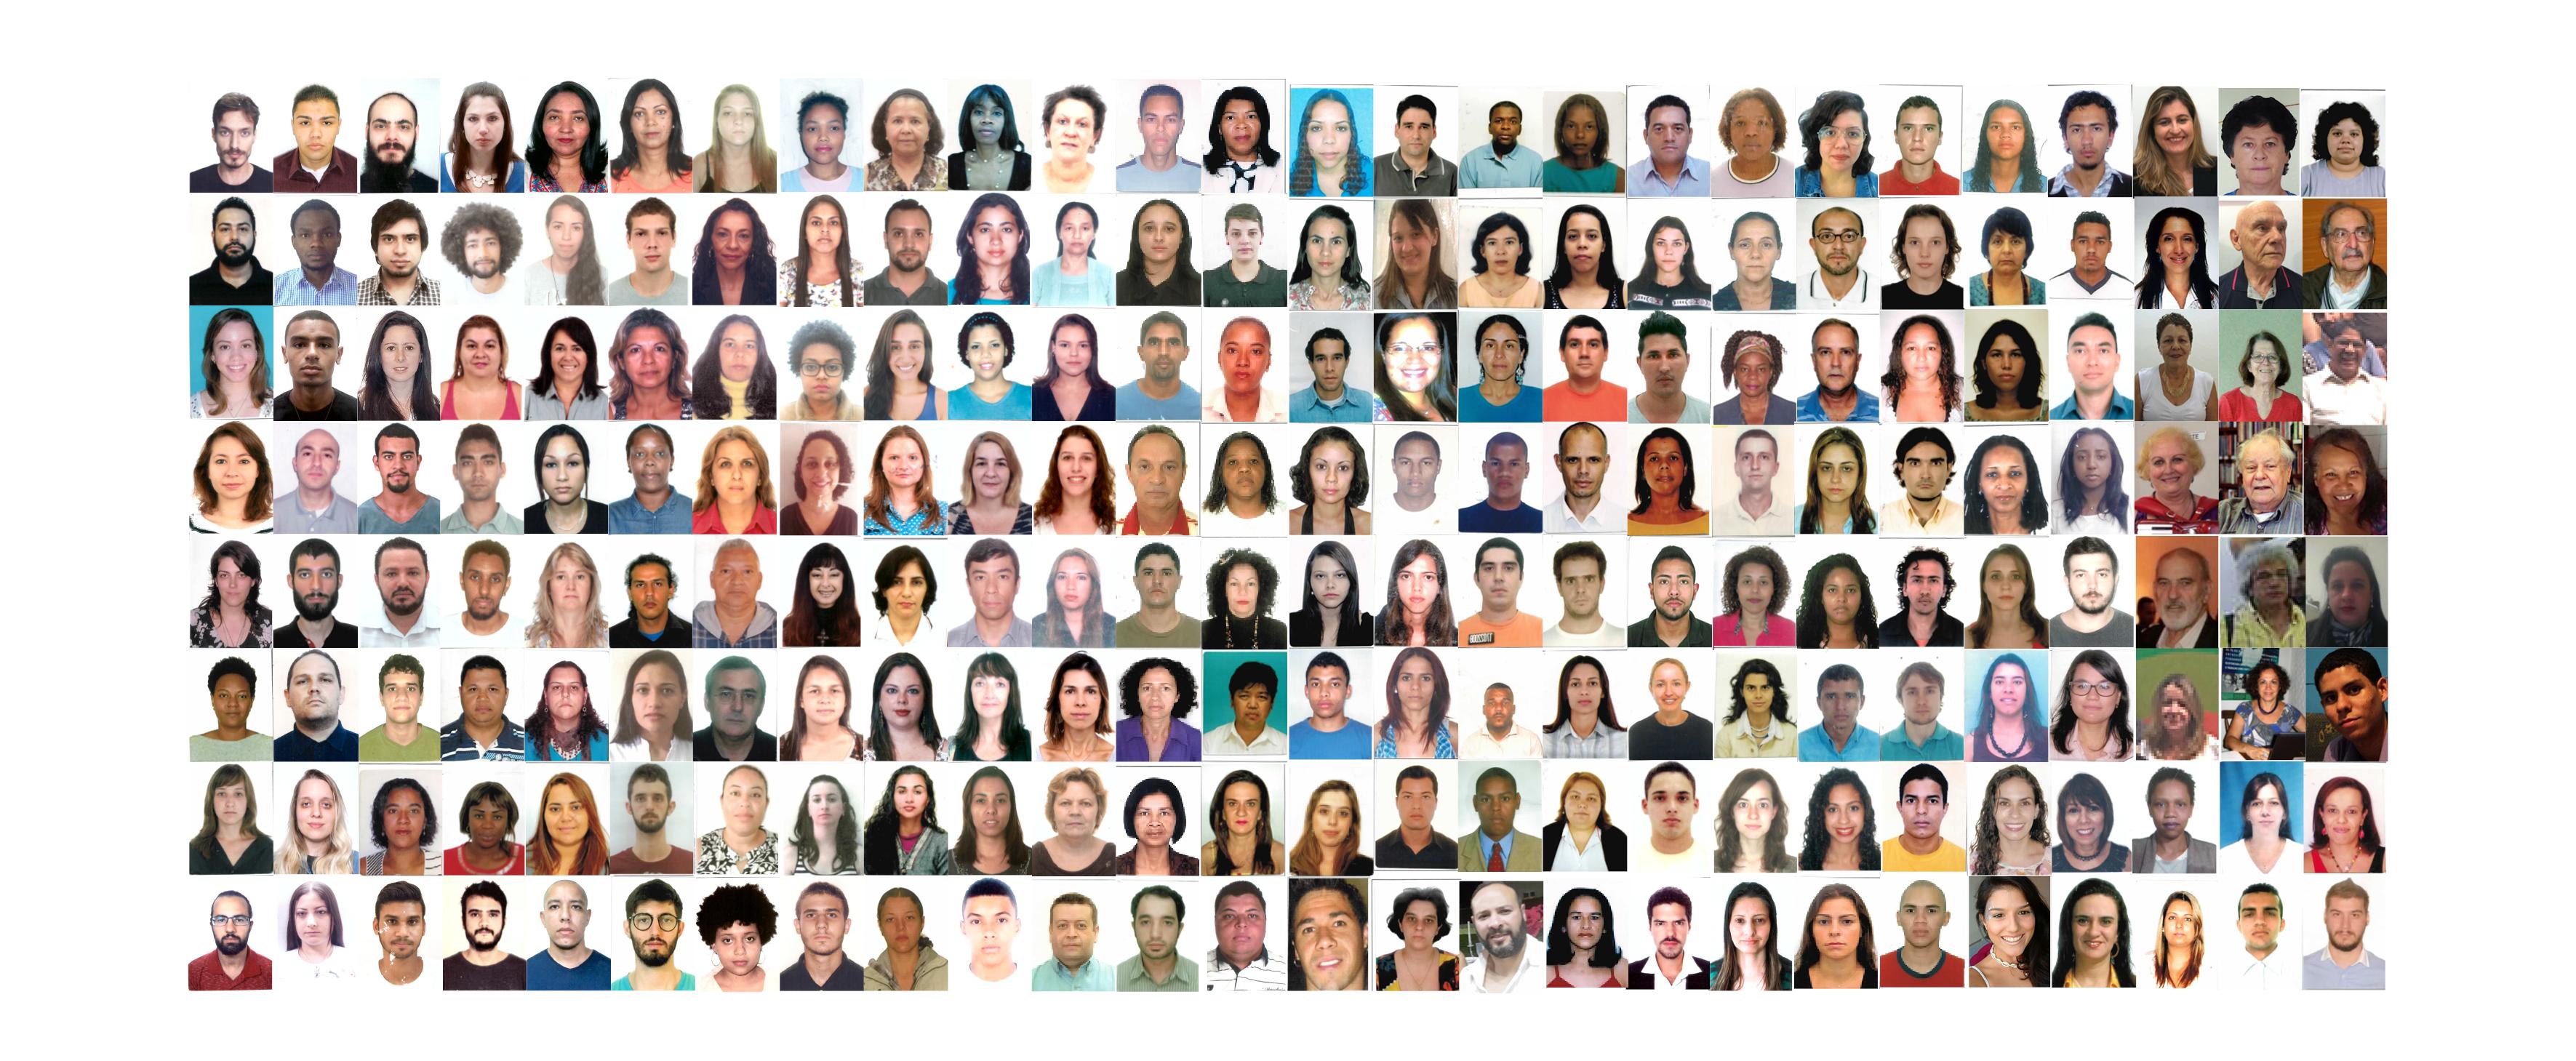 Equipe Instituto de Tecnologia Social - ITS BRASIL